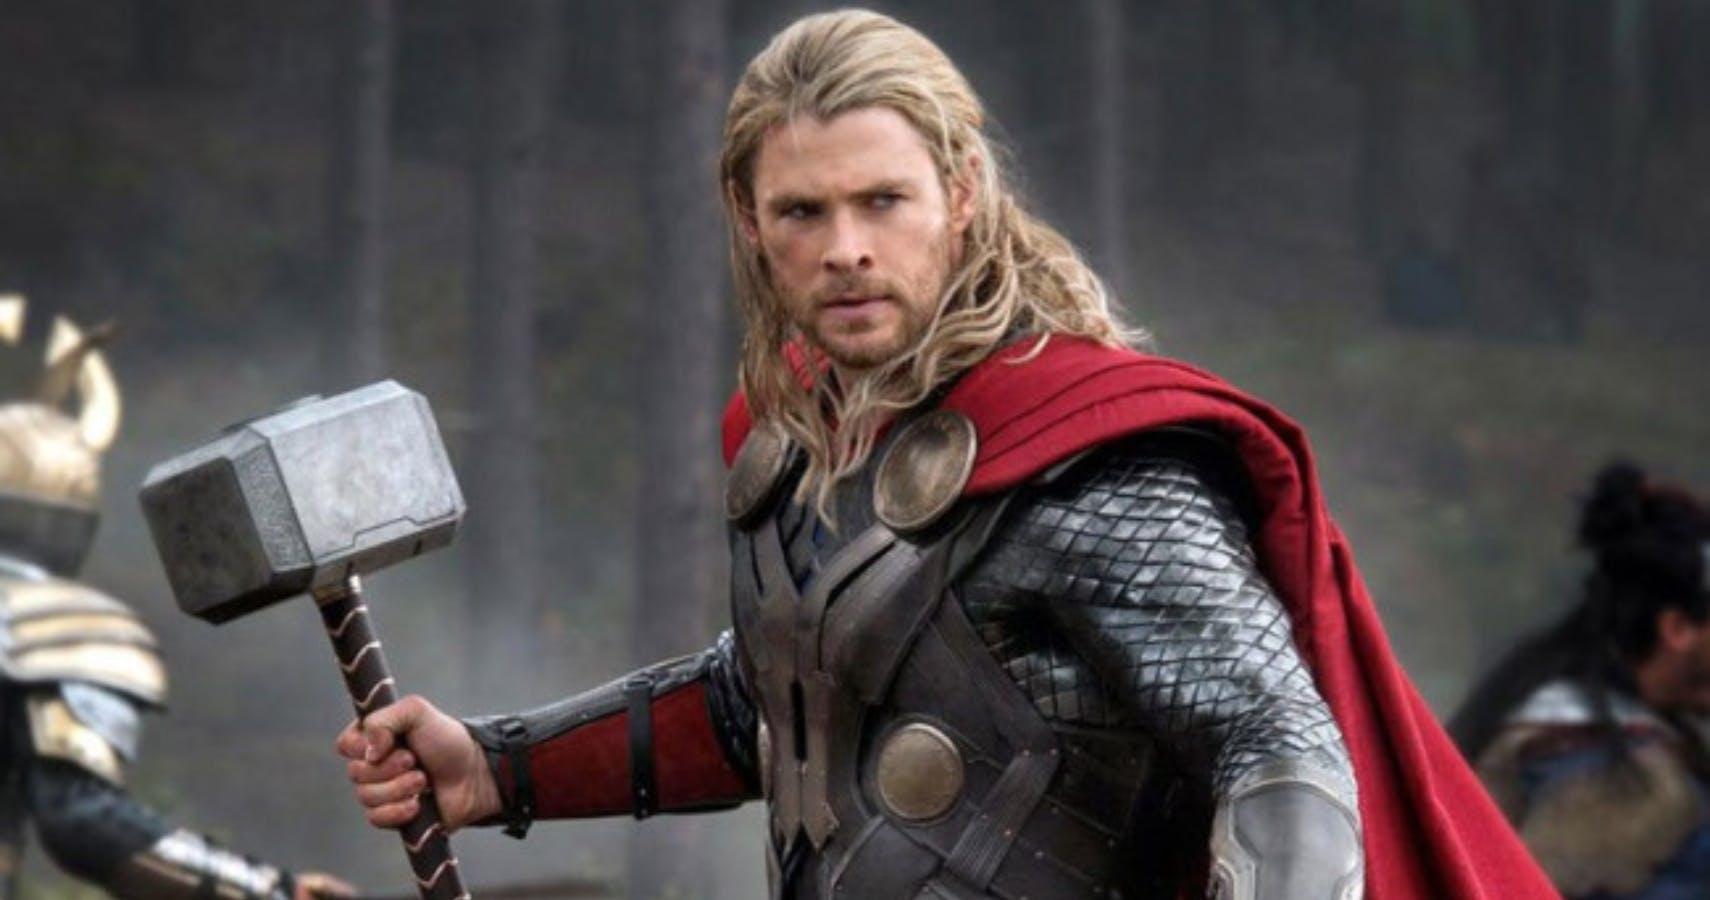 Marvel Star Chris Hemsworth To Launch New Fitness & Wellness App